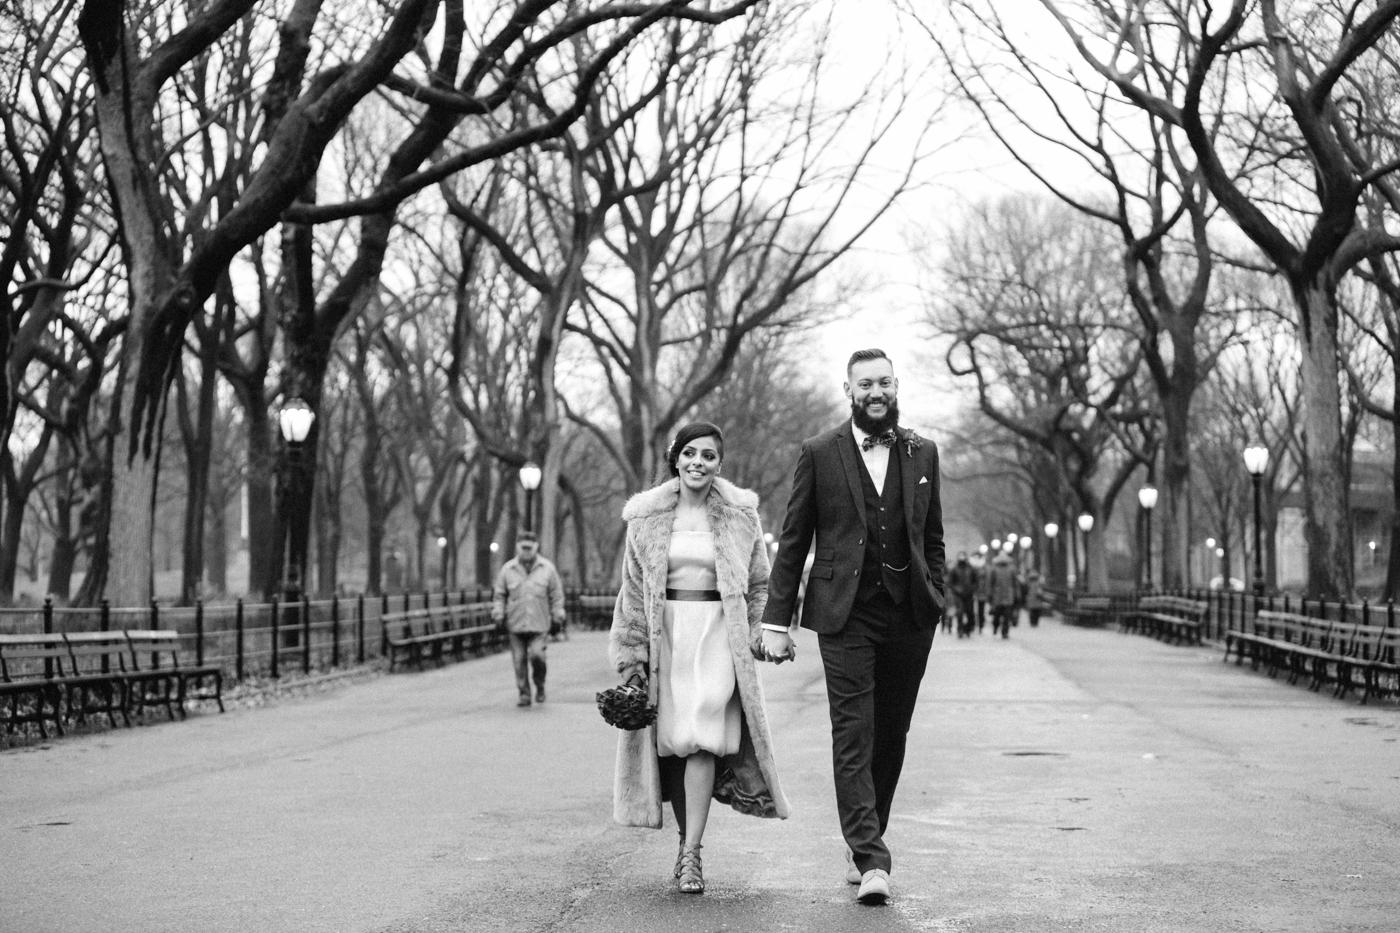 Central-park-wedding-by-Tanya-Isaeva-117.jpg